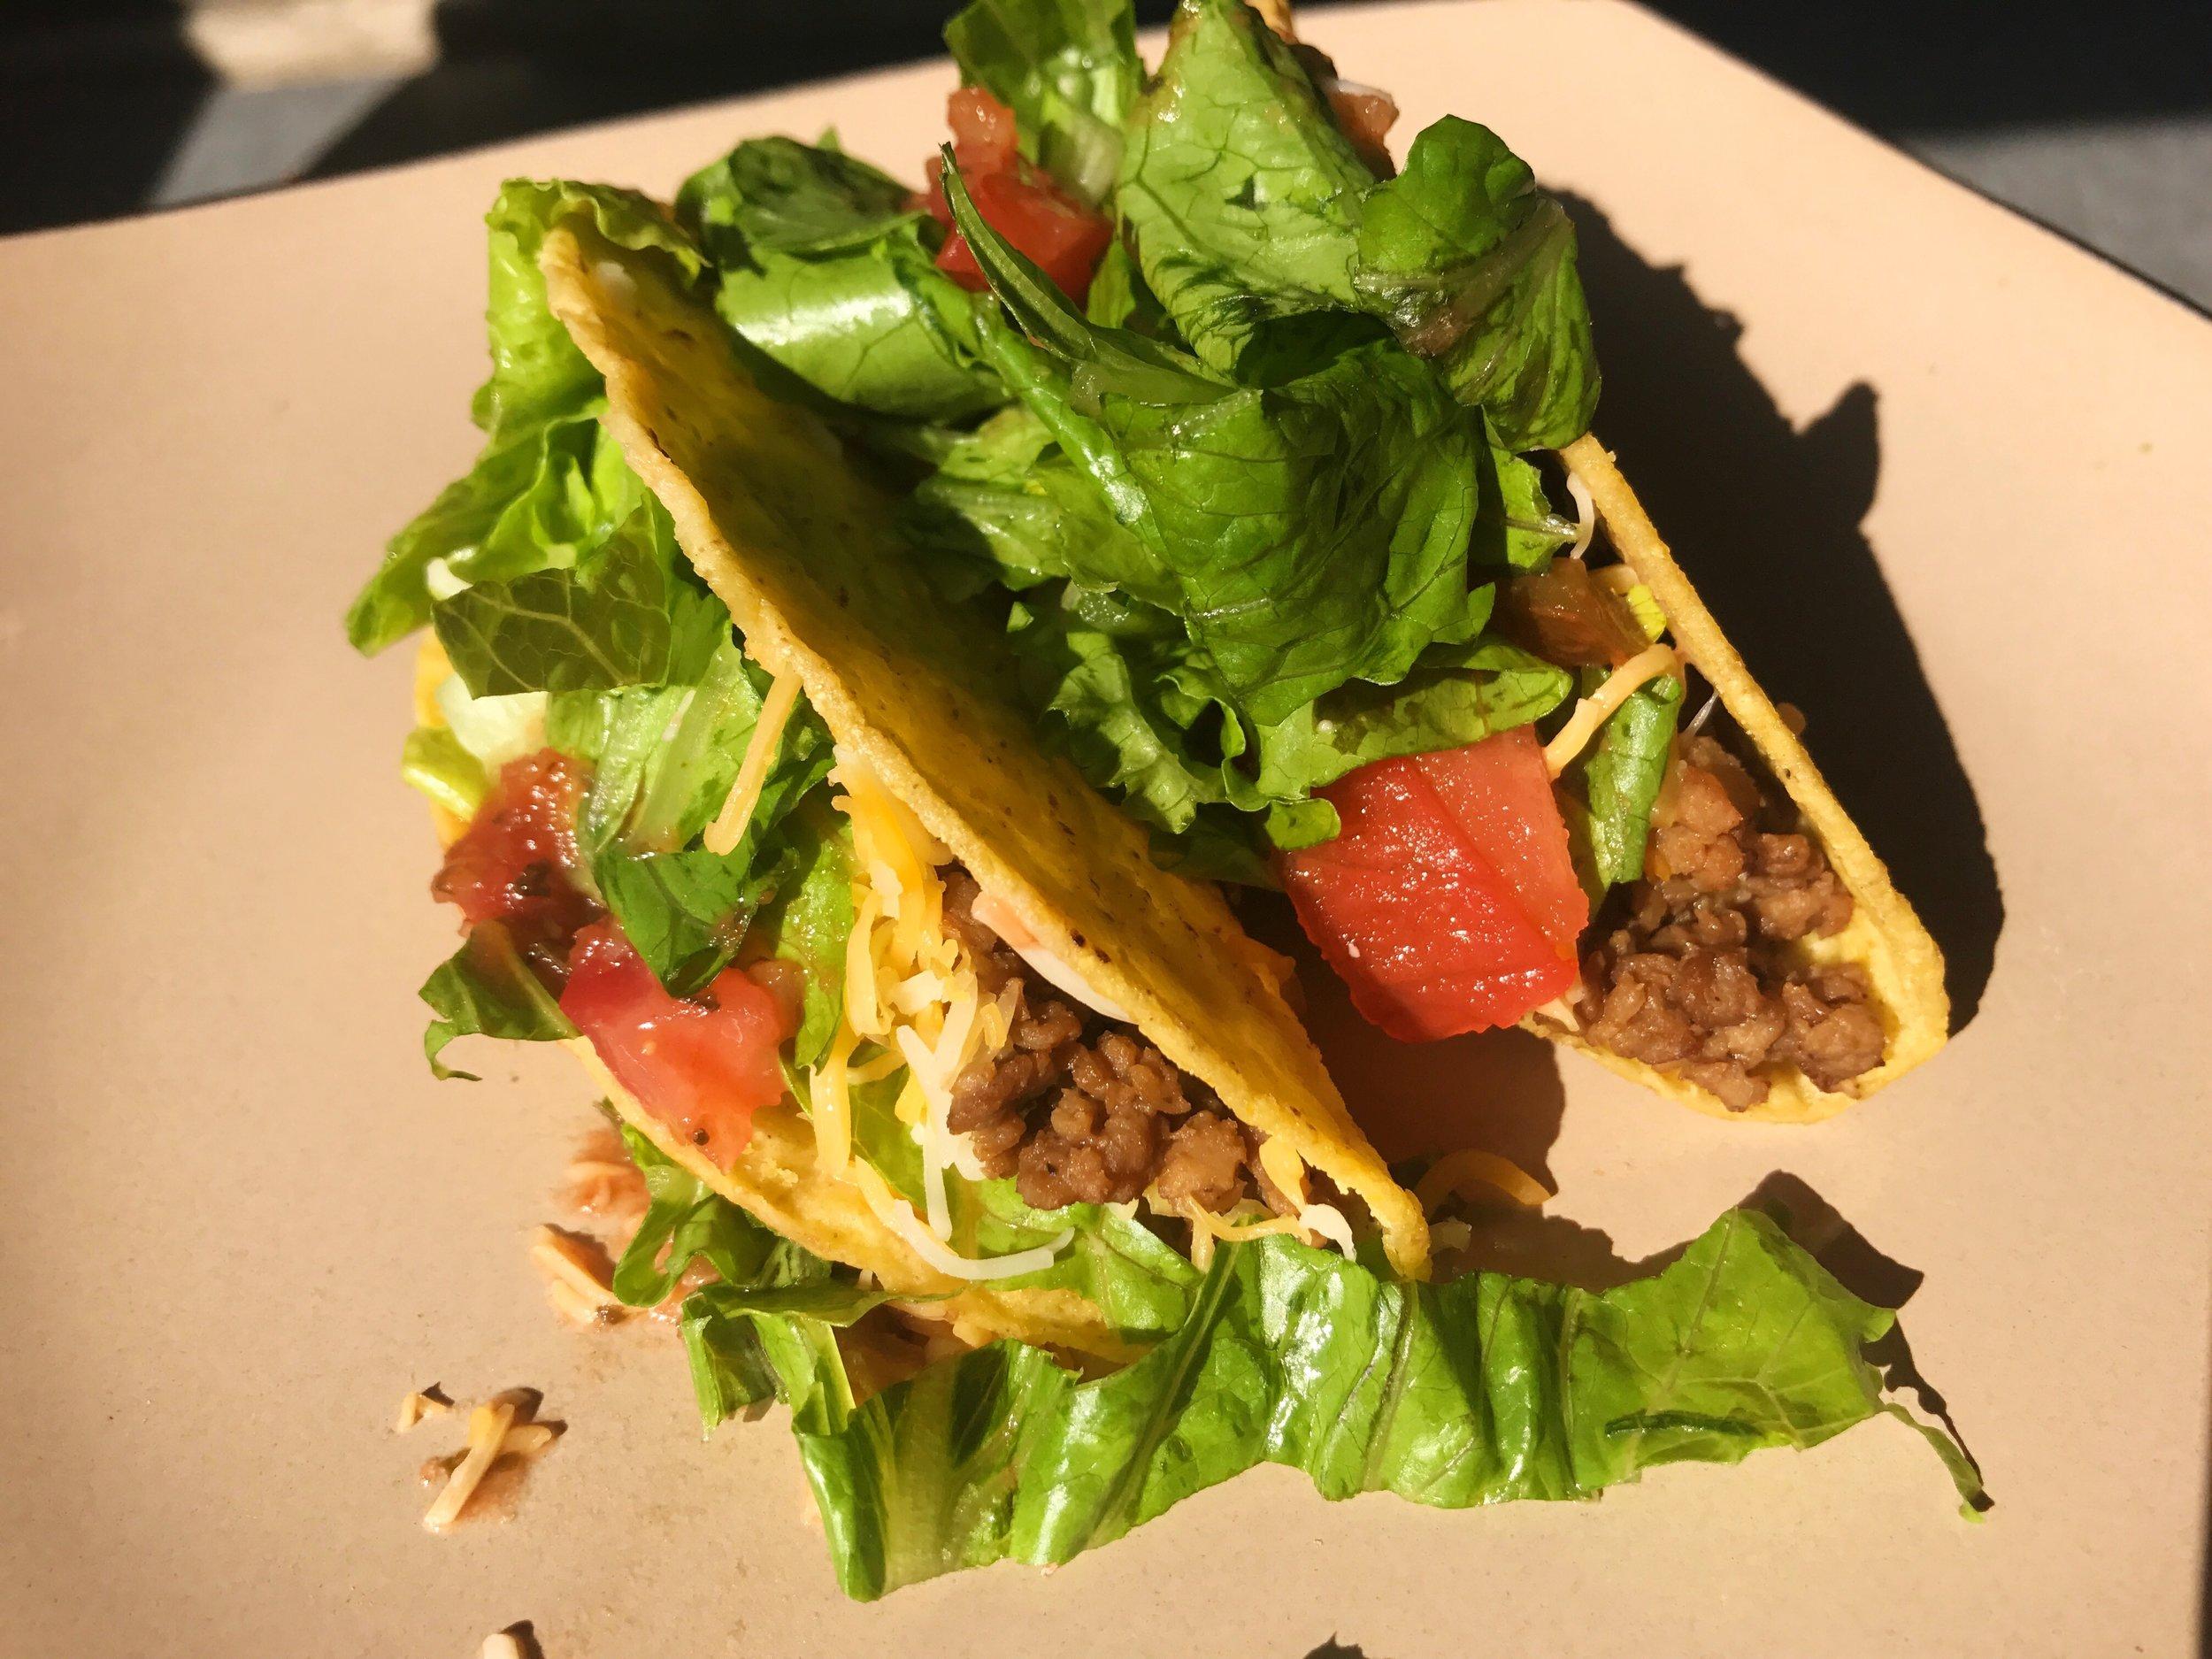 Meatless Crunchy Tacos